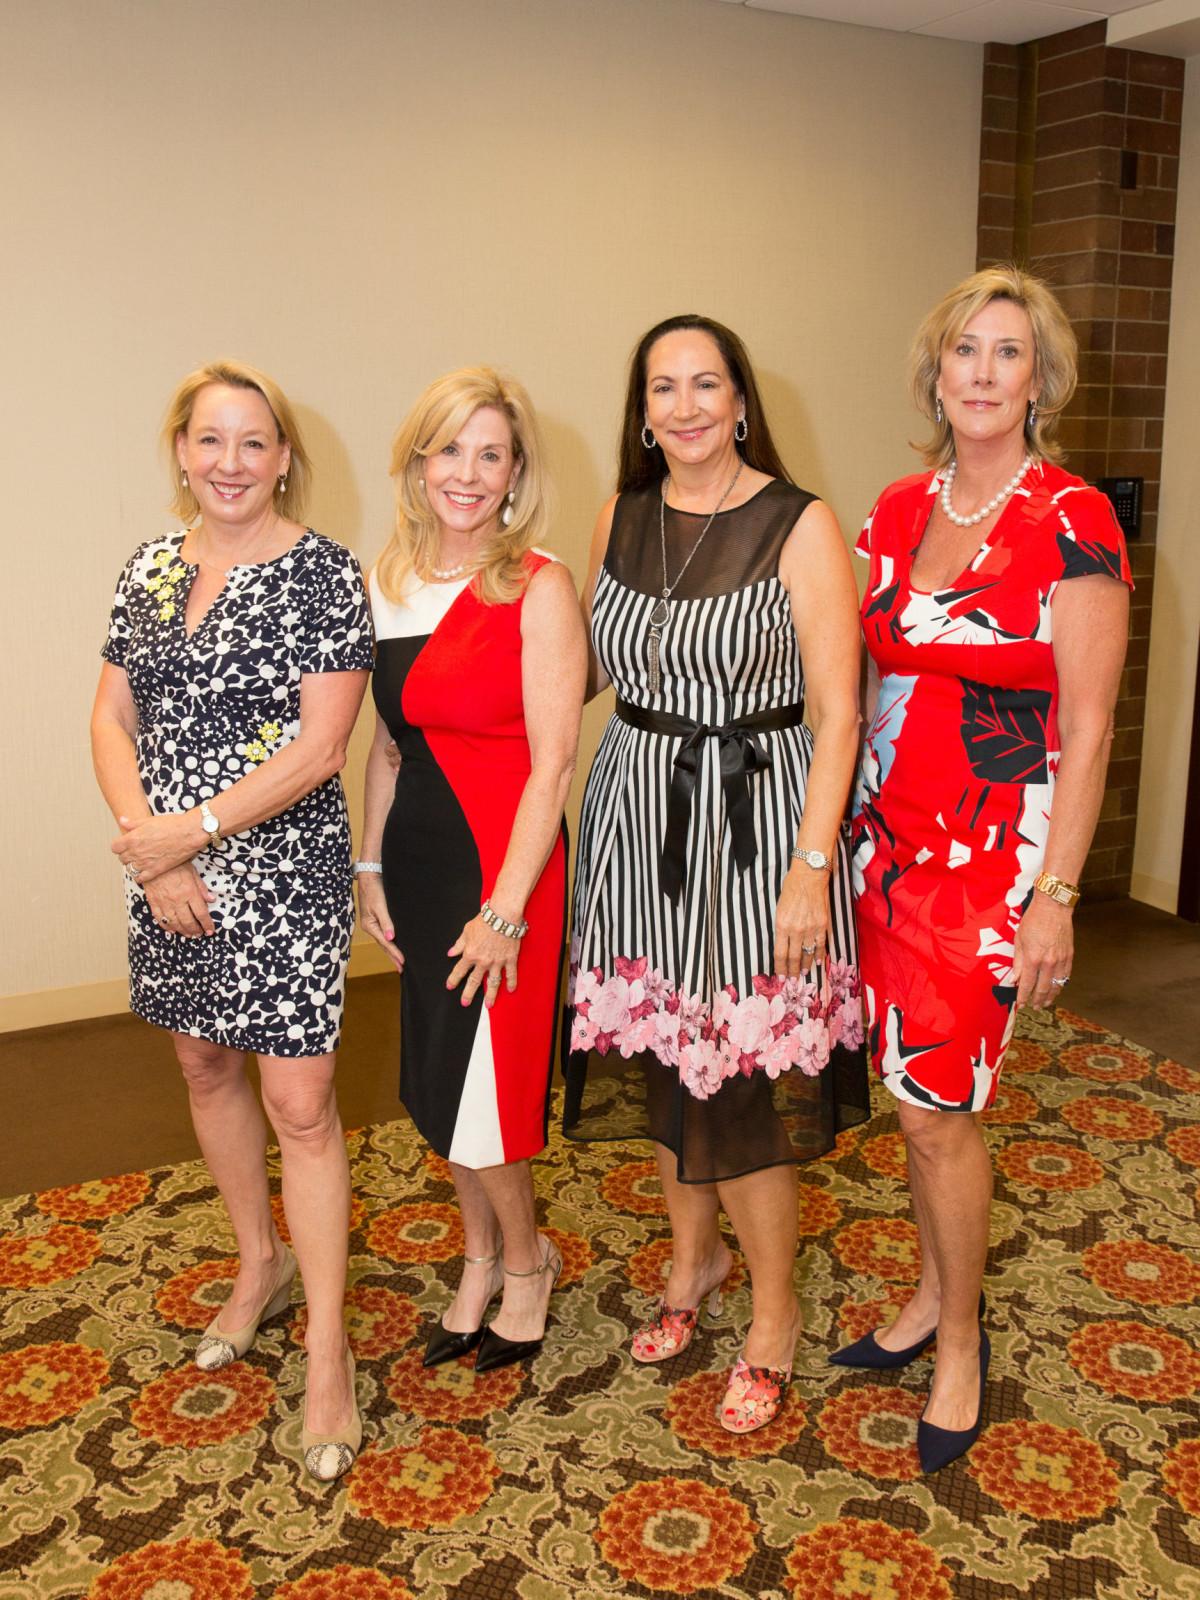 Sally Dietz, Maureen Redish, Cindy Turner, Karen Carney